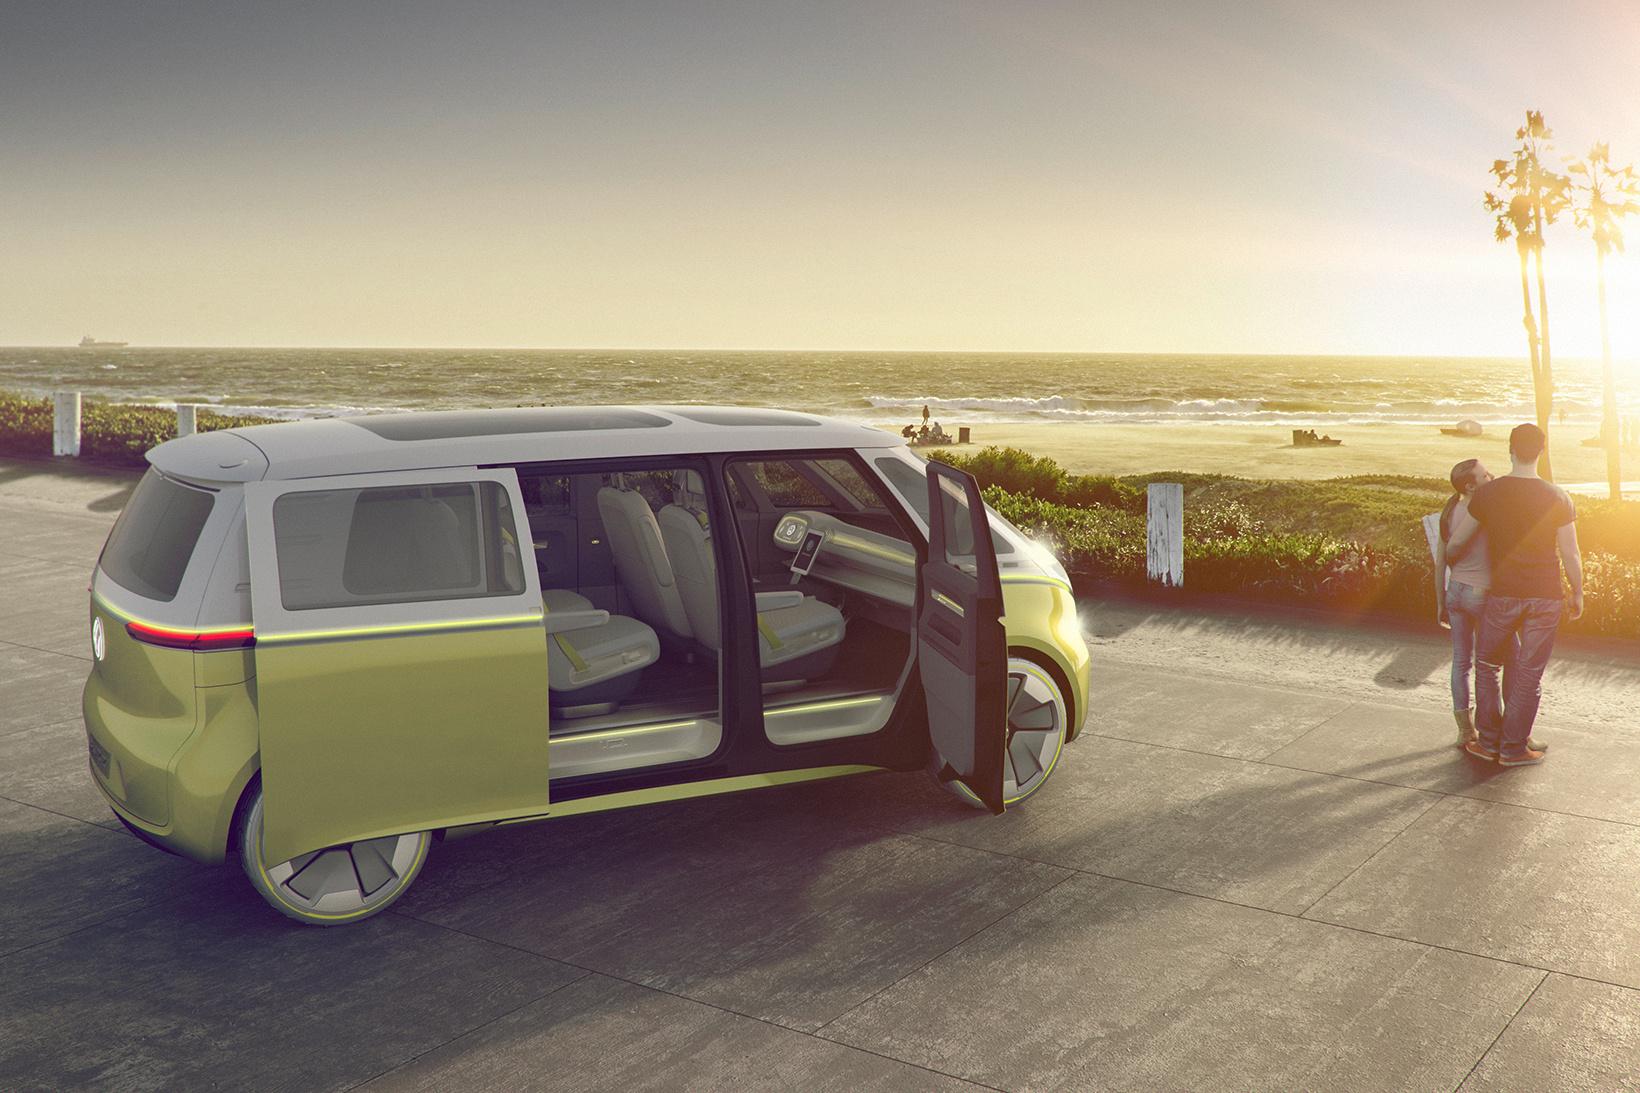 volkswagen-id-buzz-concept-car-3